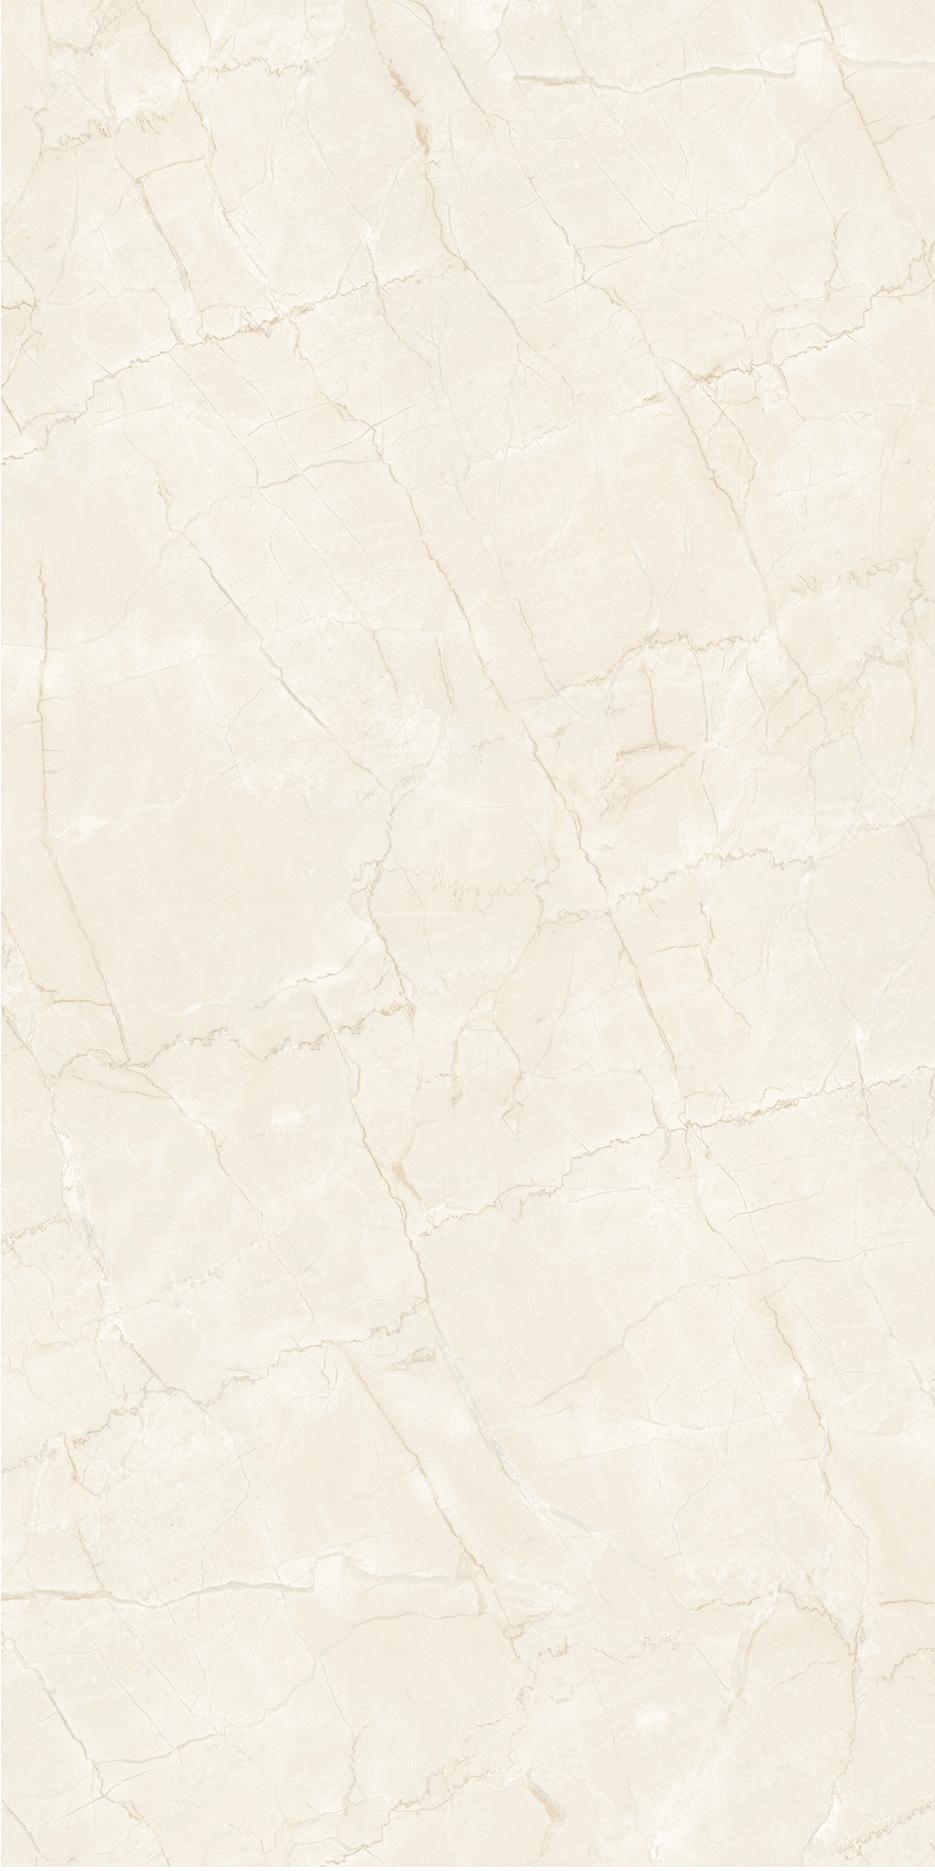 冰洞米黄 HPEG1890052,900x1800mm